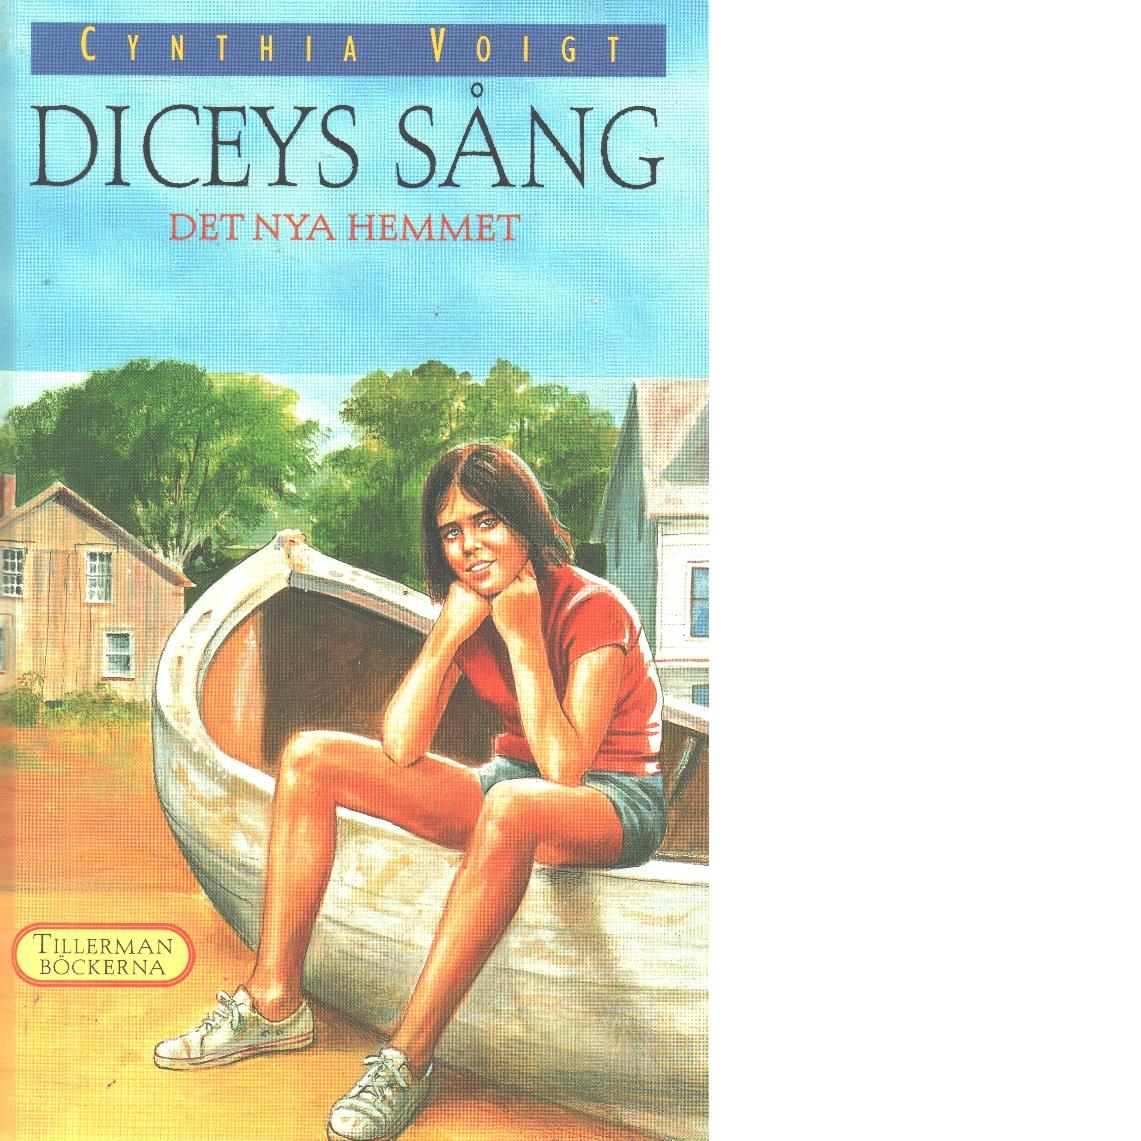 Diceys sång : det nya hemmet - Voigt, Cynthia